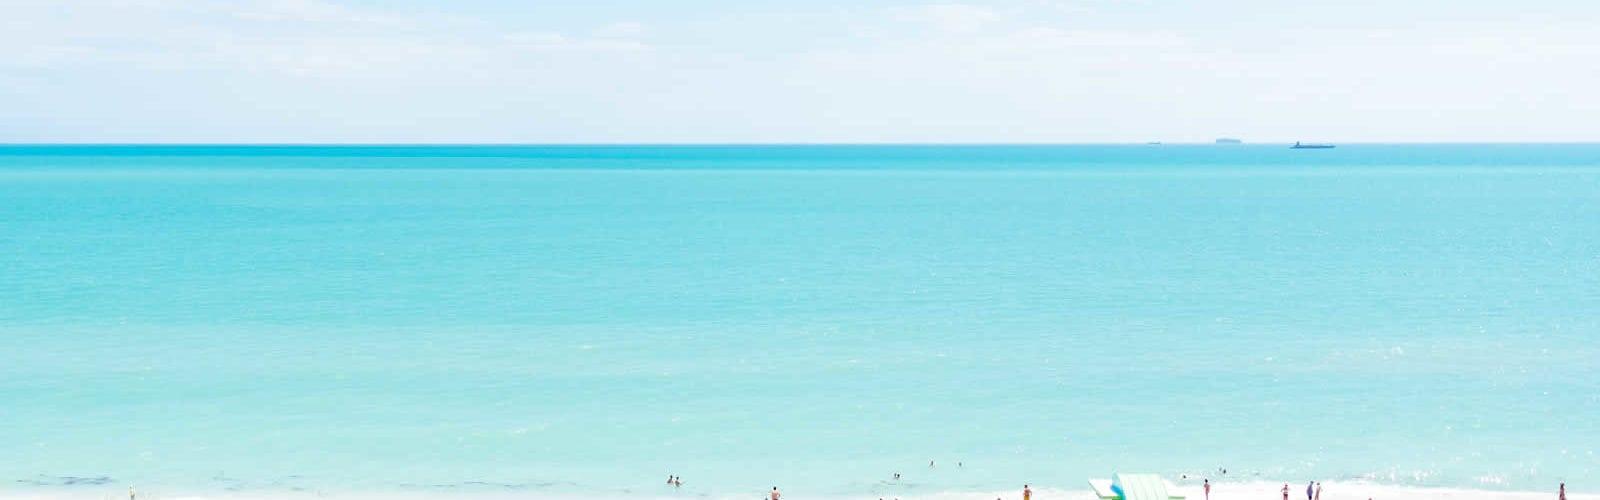 south-beach-miami-vacances-week-end-visiter-une